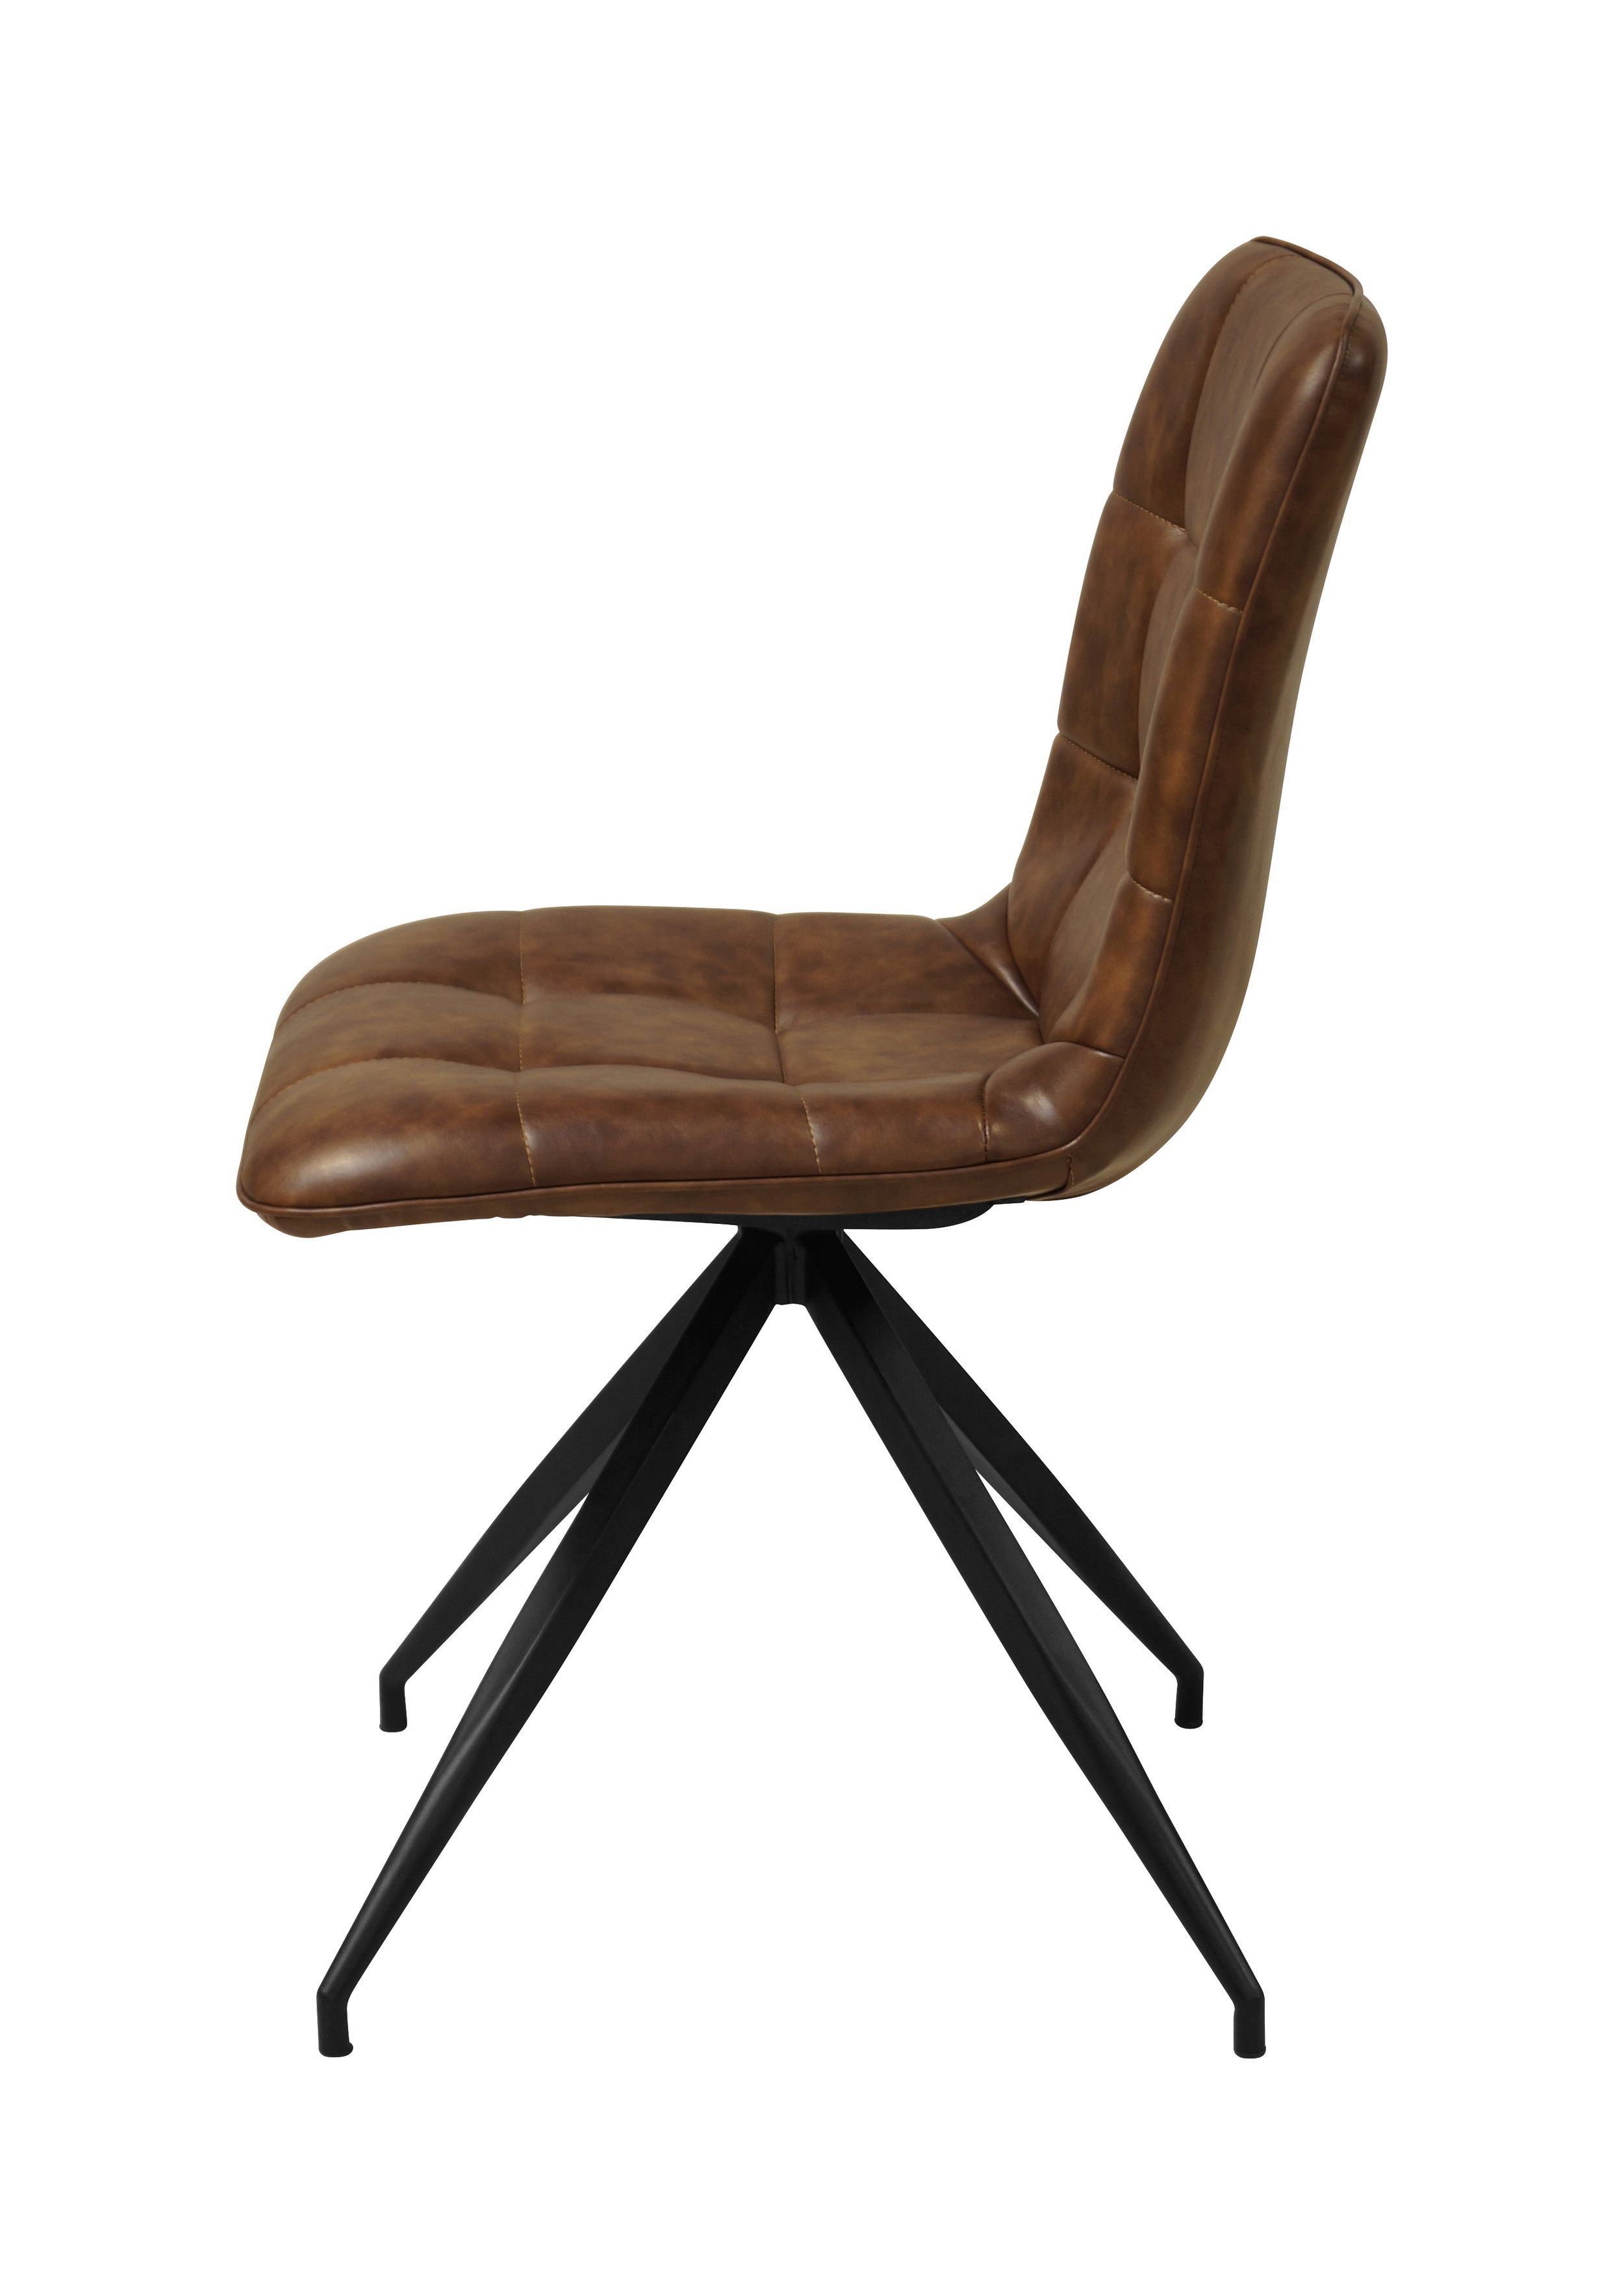 Dutch Spisebordsstol m. Brun PU - Brun spisebordsstol i kunstlæder